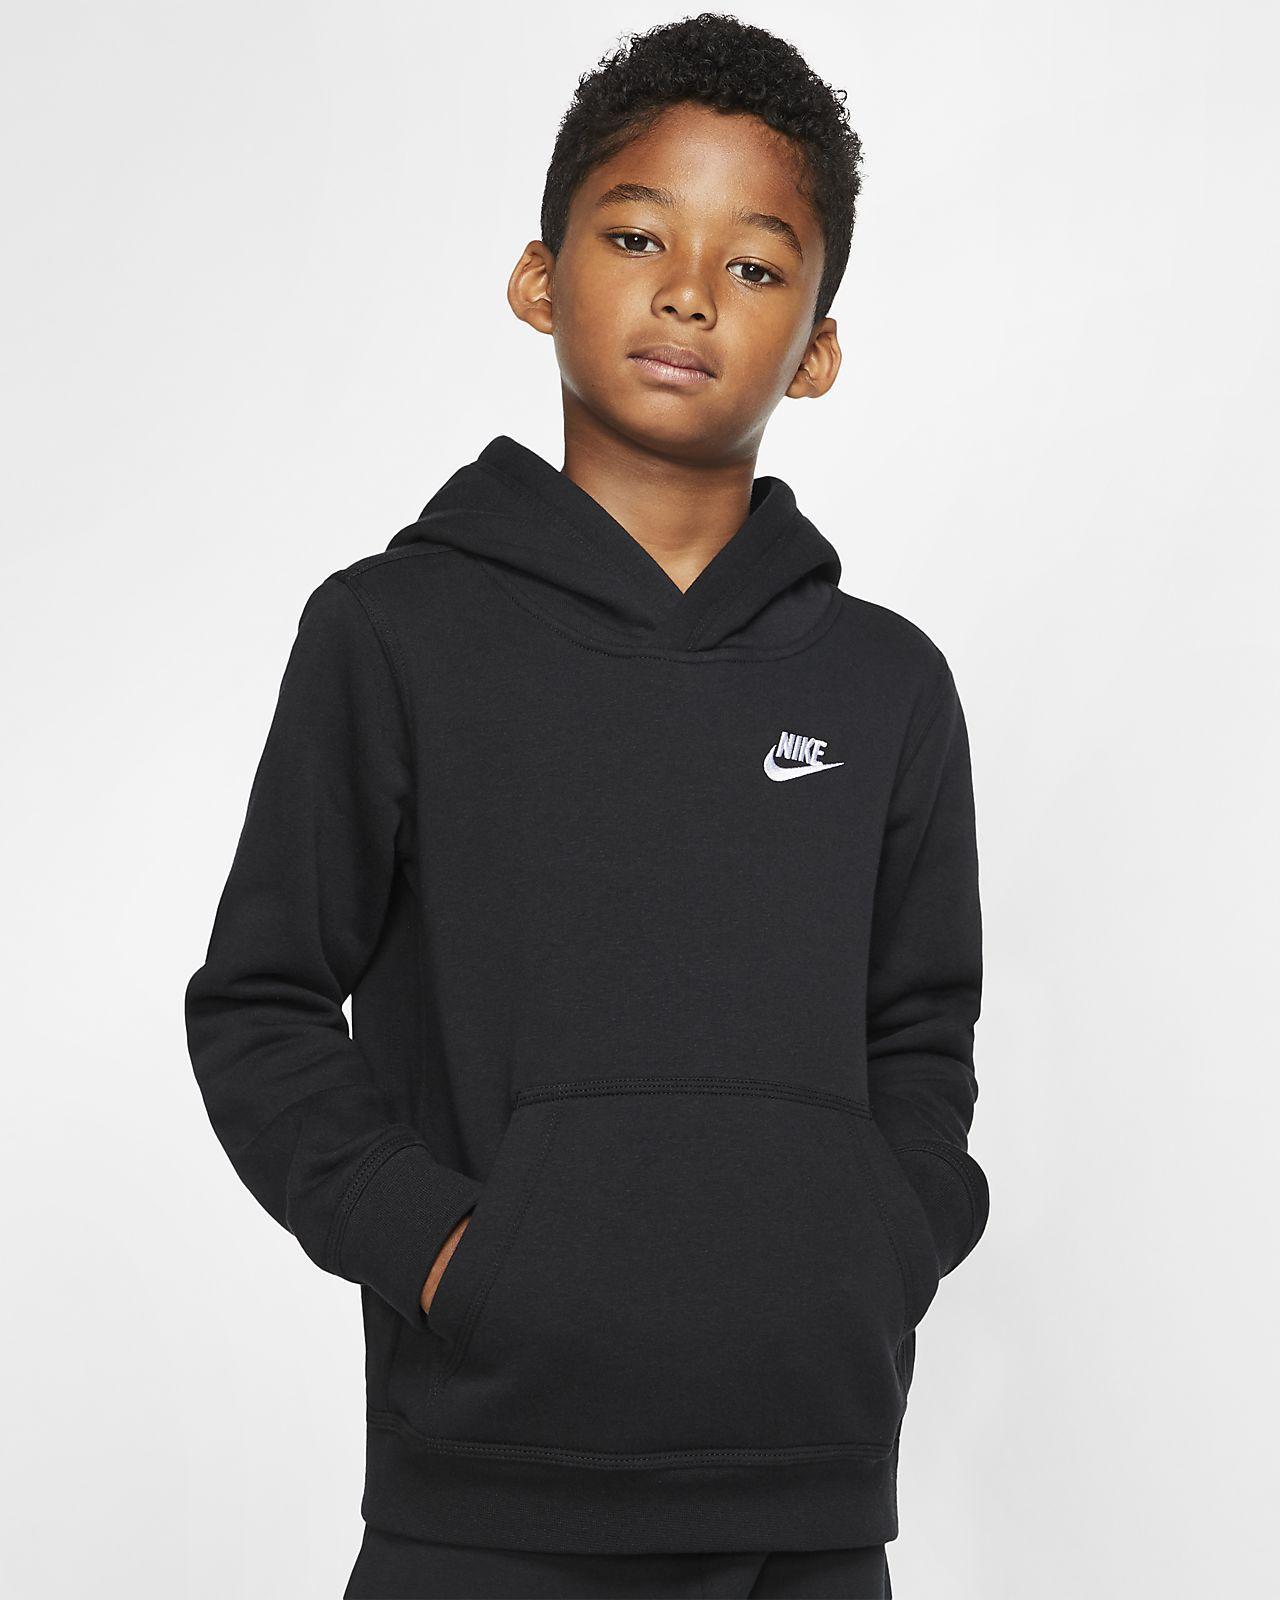 Sweatshirt à capuche Nike Sportswear Hoodie FZ noir logo blanc